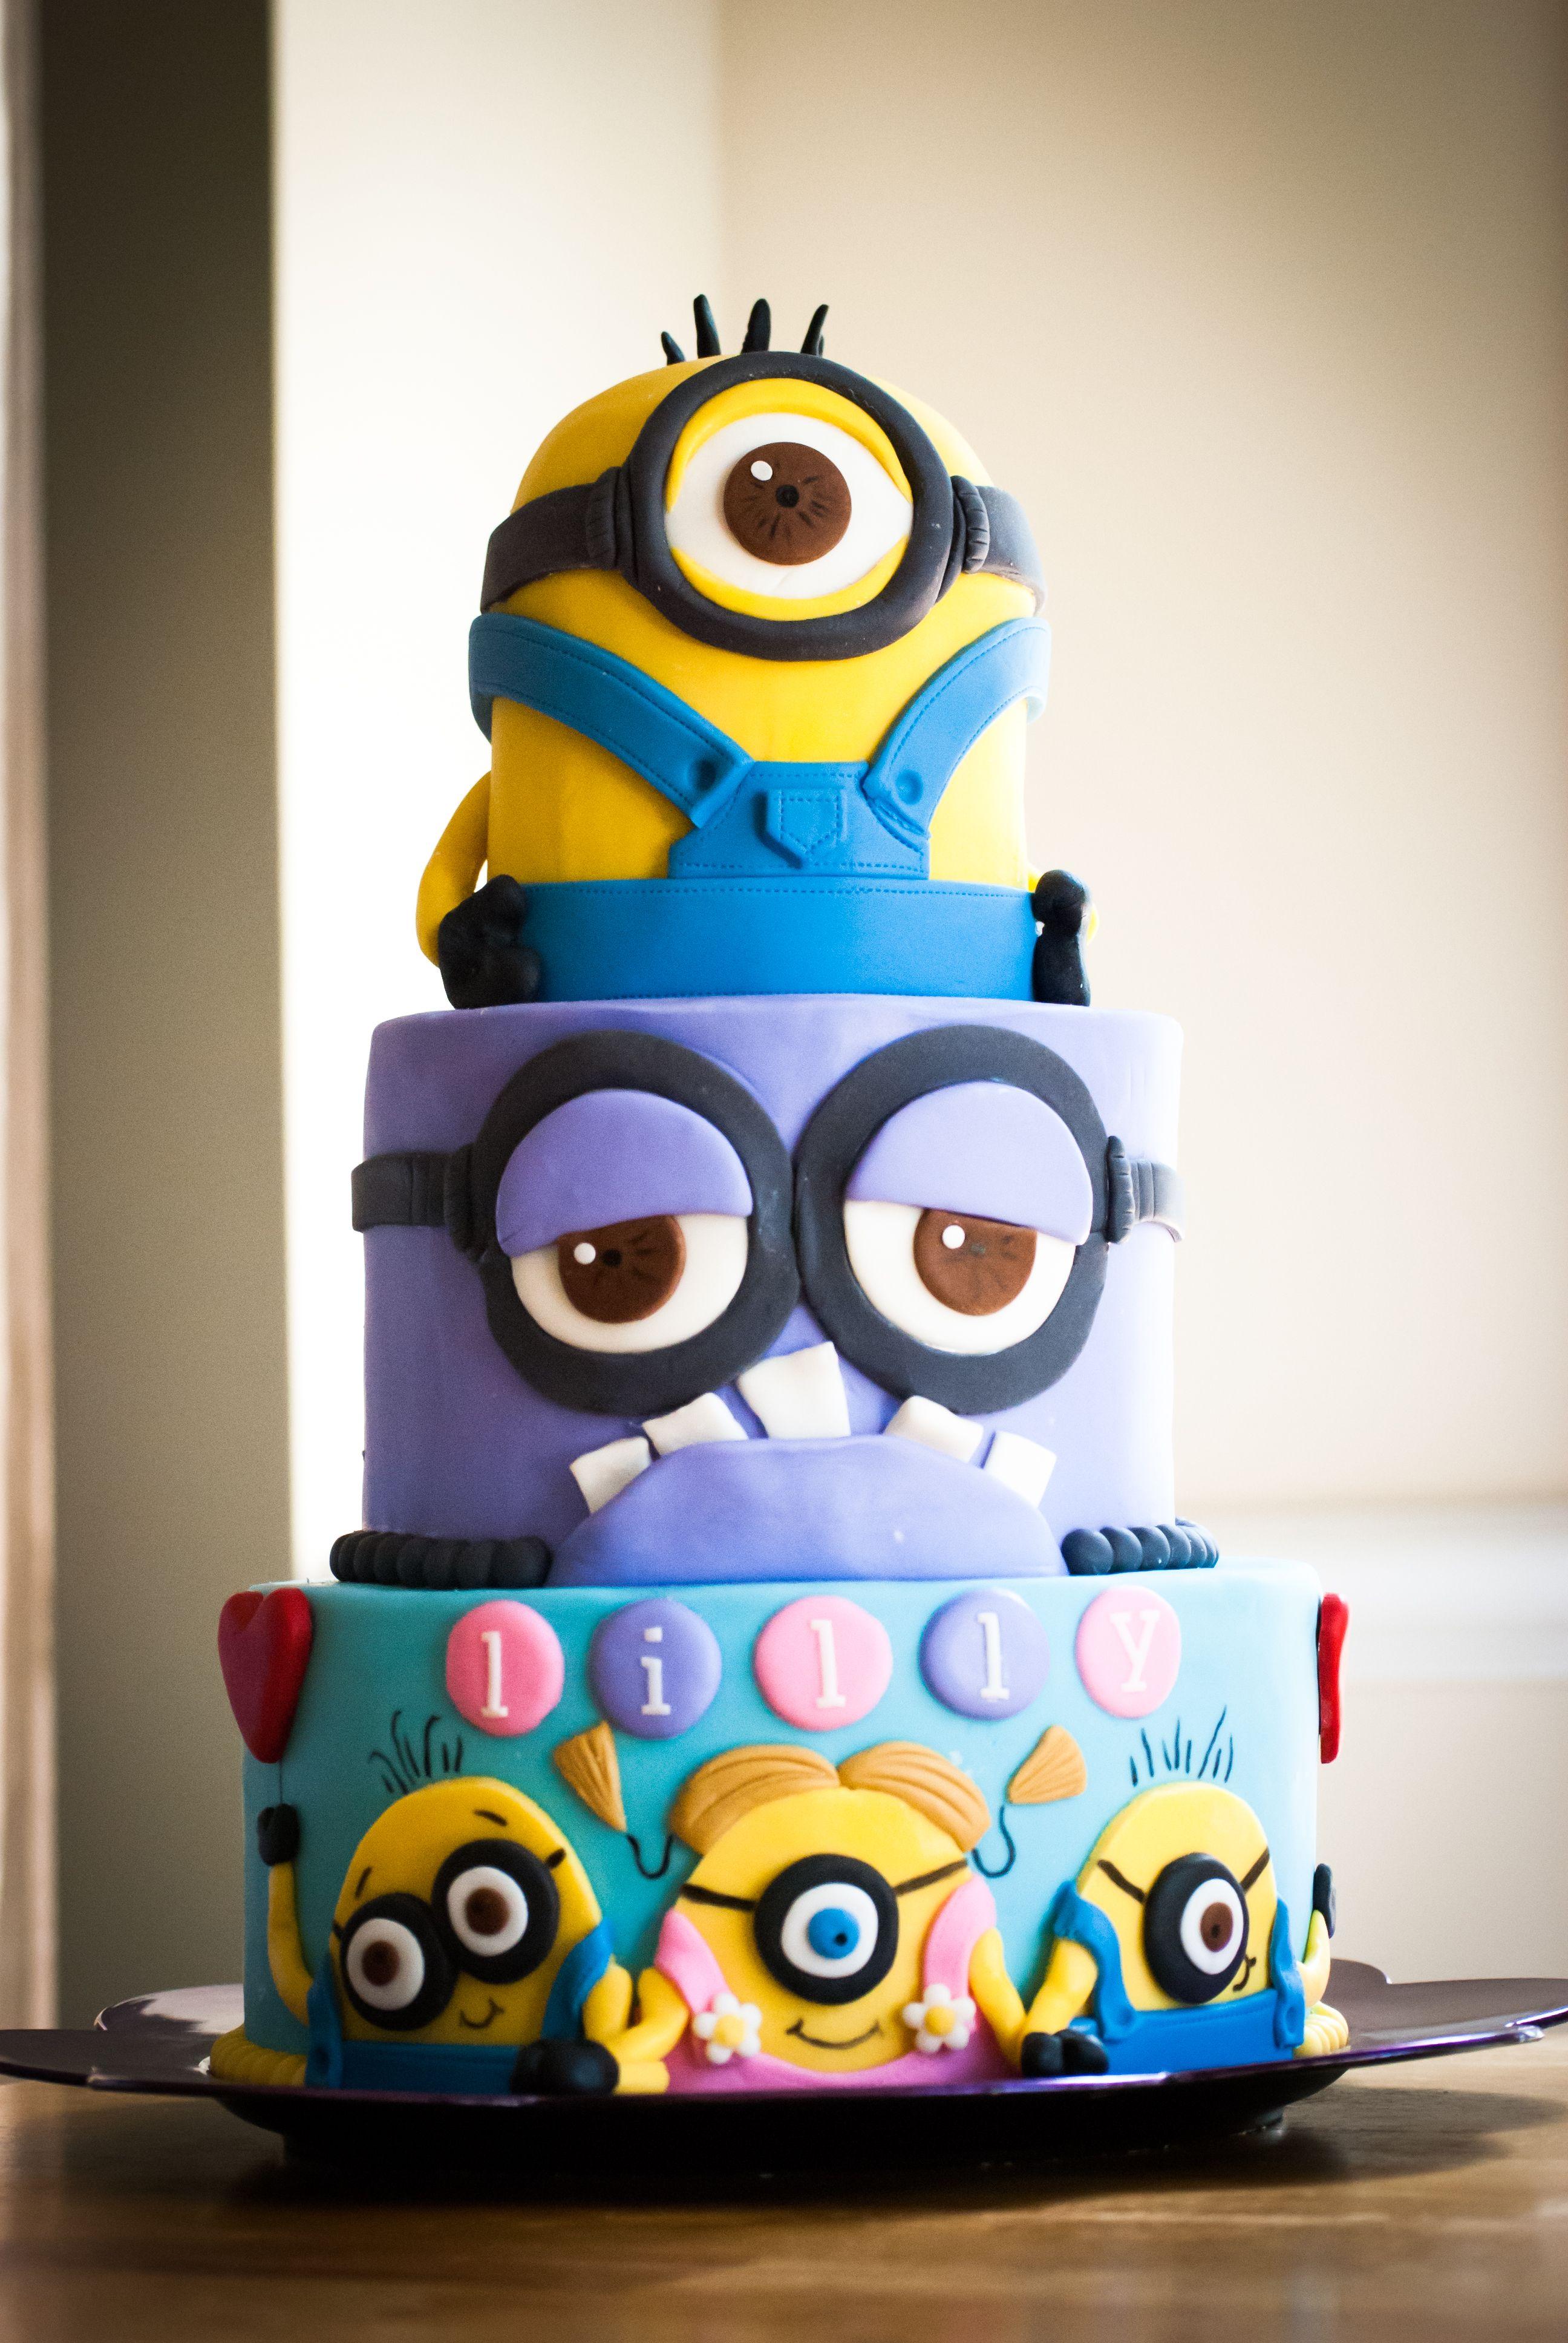 Minion first birthday cakes google search minions pinterest birthday cakes cake and - Cake decorations minions ...